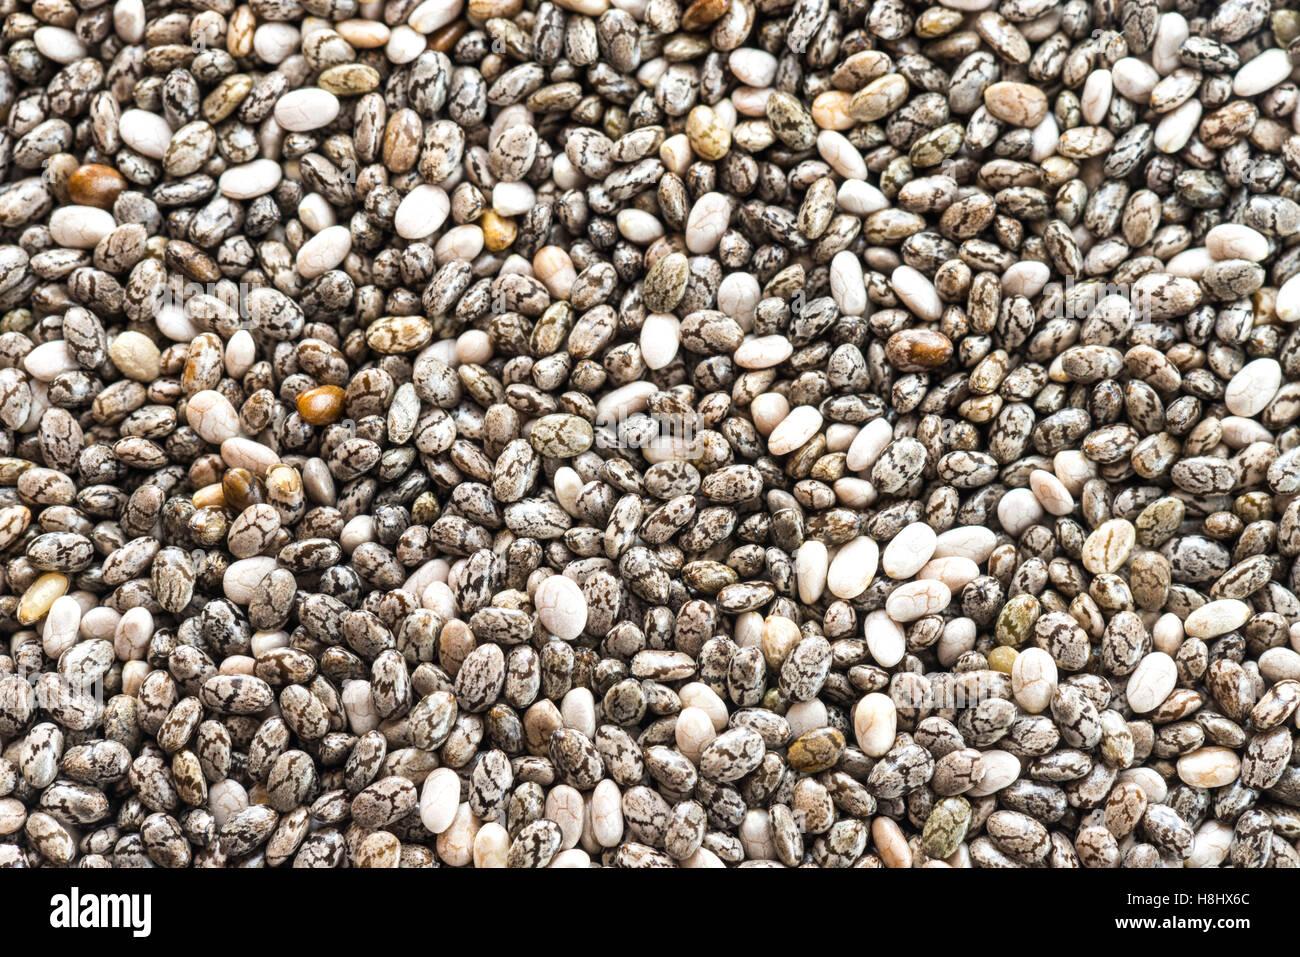 Macro shot de chia semillas, imagen completa para su uso como alimento o texturas de fondo Imagen De Stock